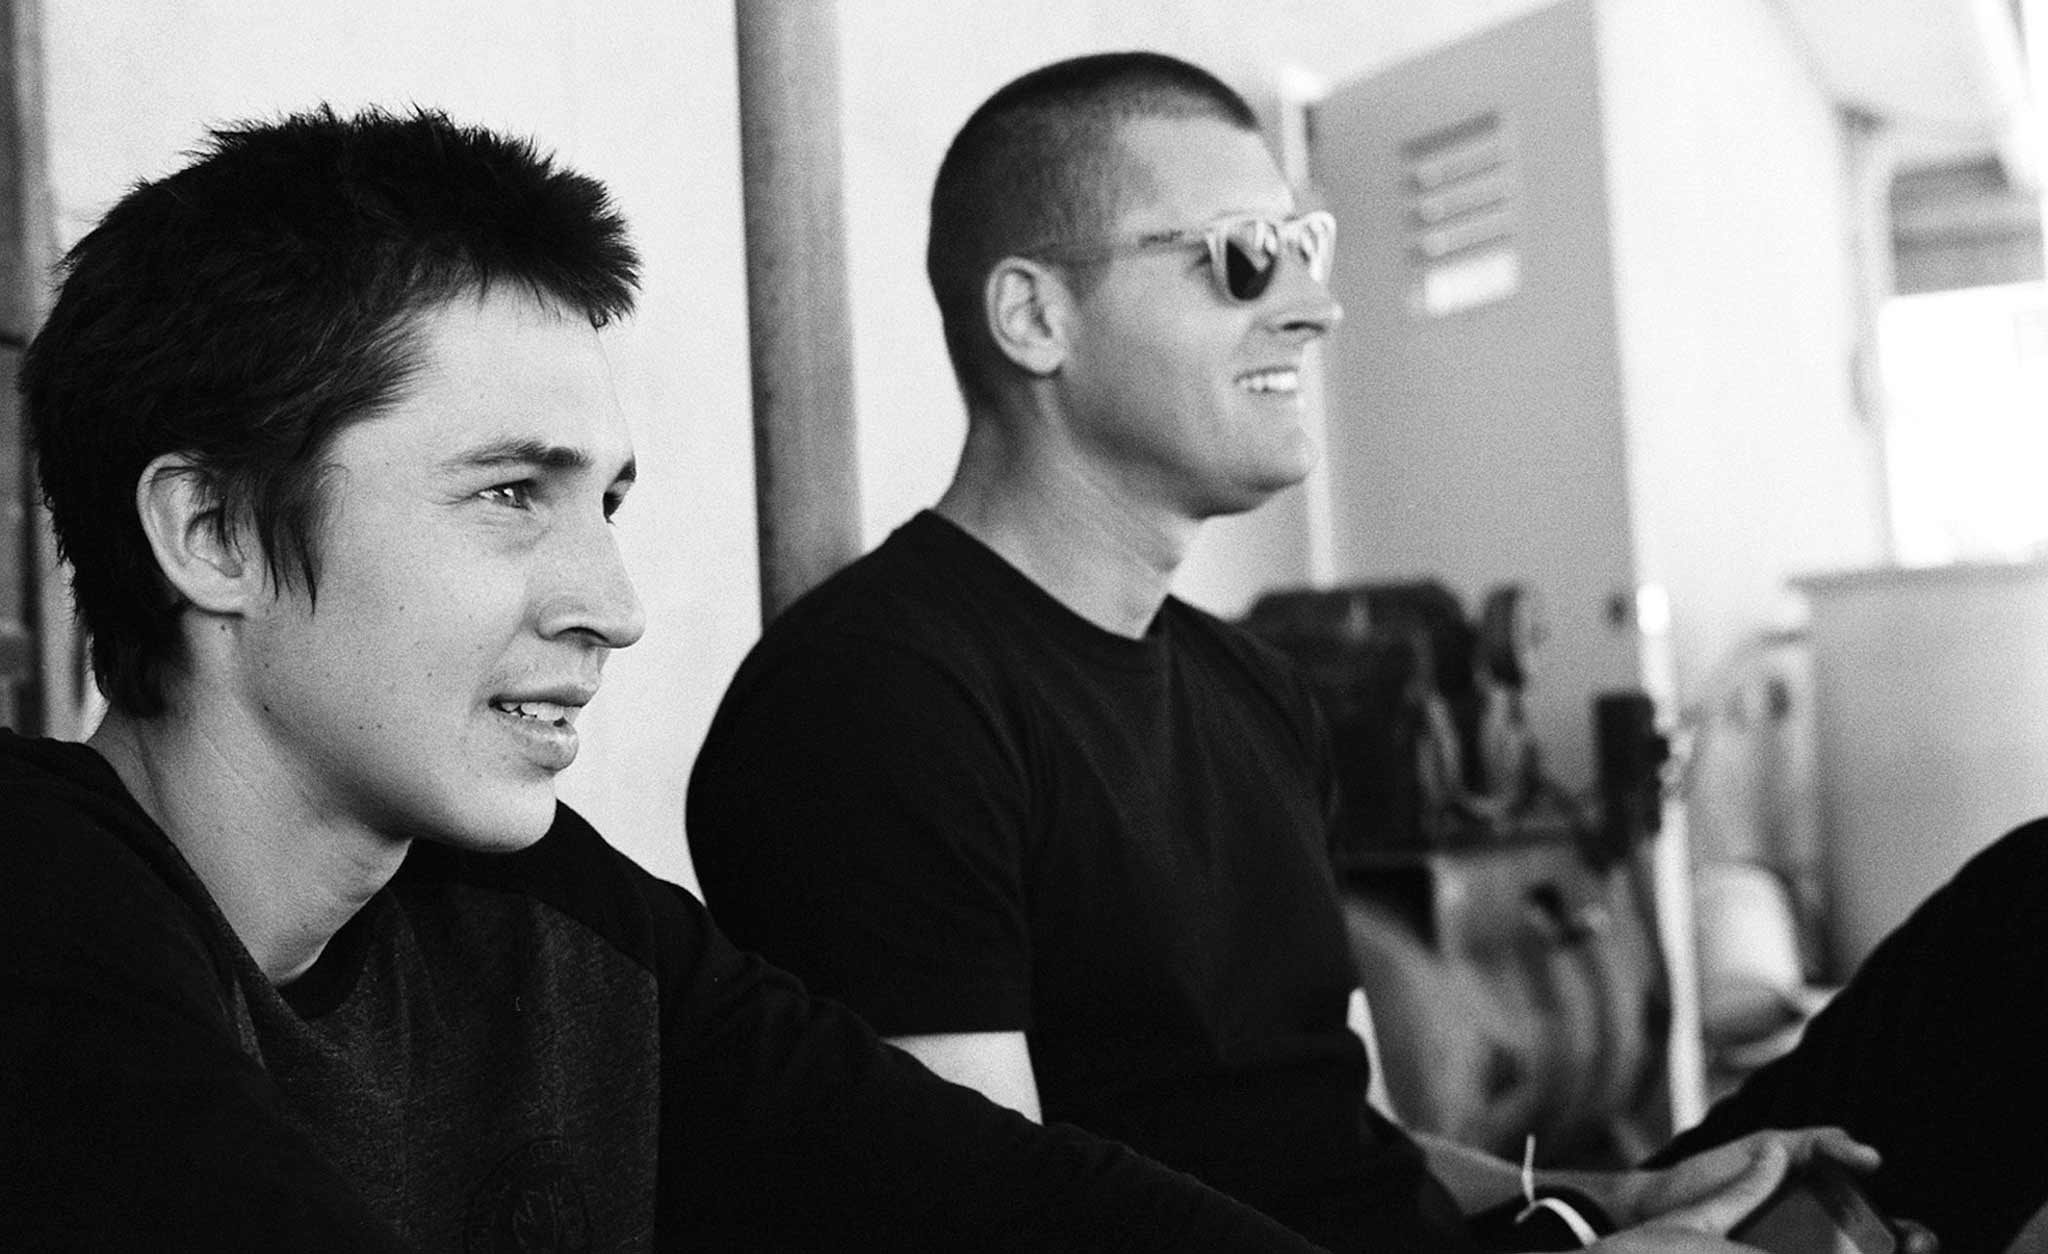 Elijah Berle and Ty Evens